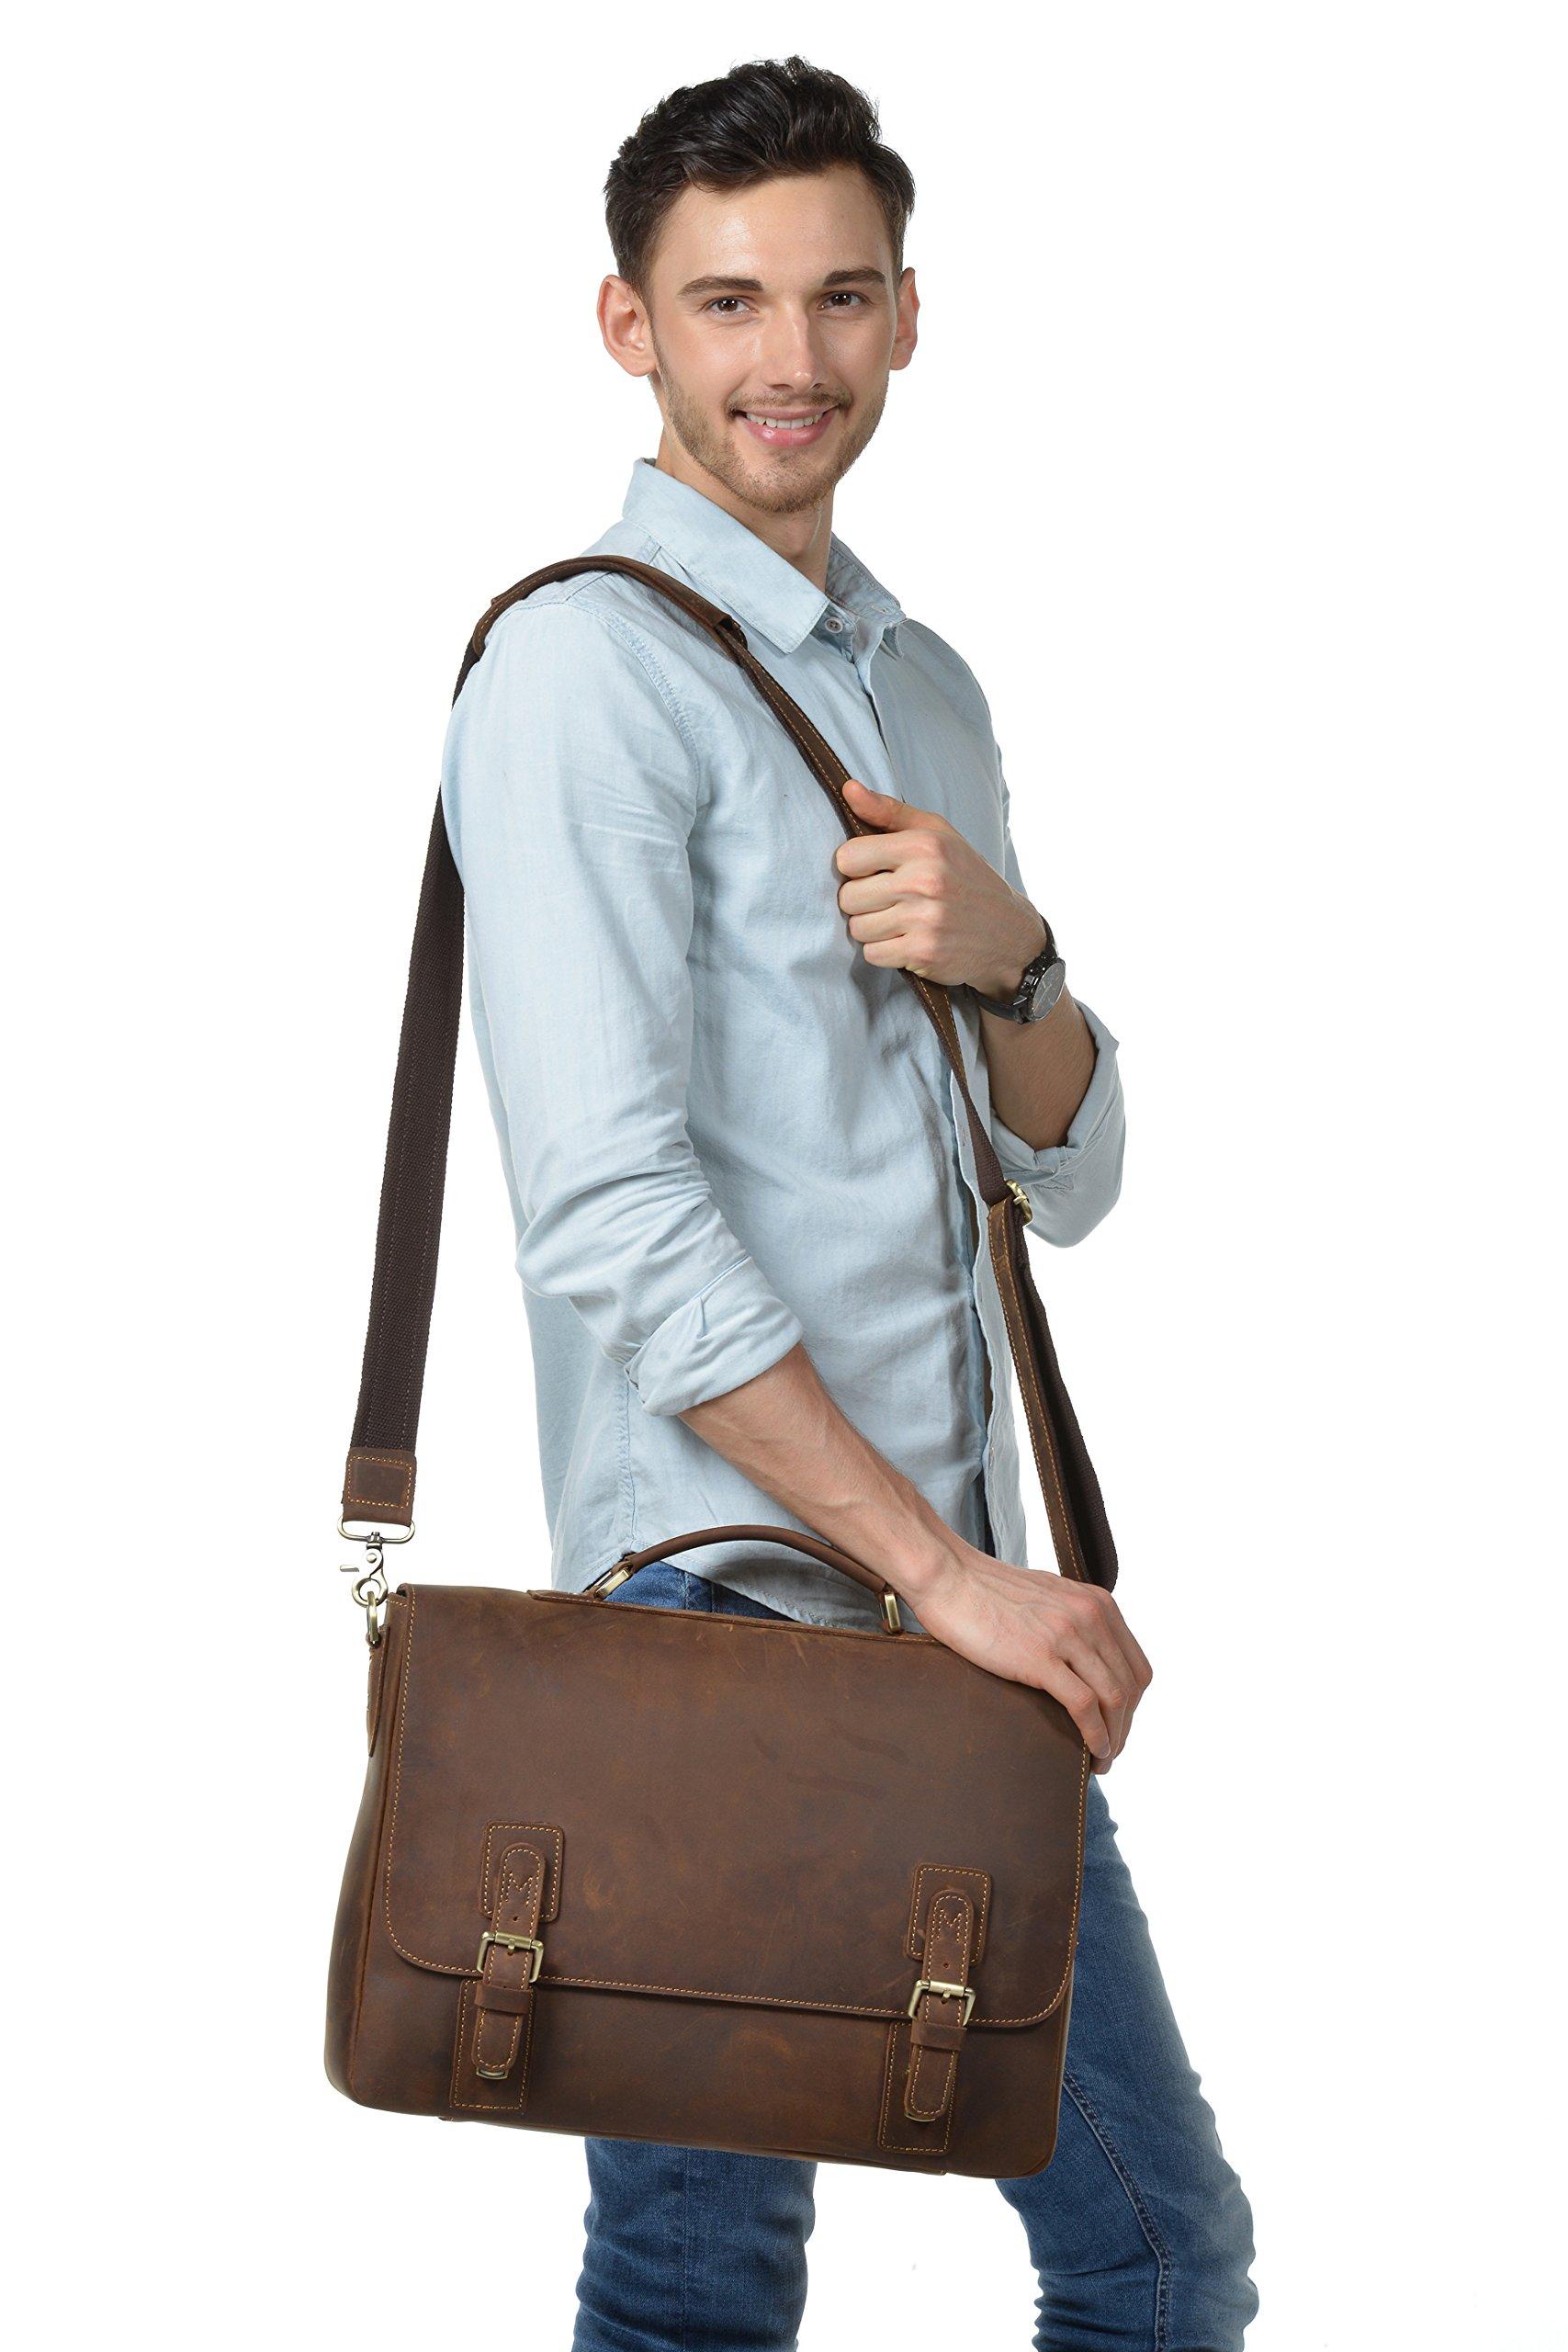 Kattee Men's Crazy Horse Leather Satchel Briefcase, 14'' Laptop Tote Bag by Kattee (Image #7)